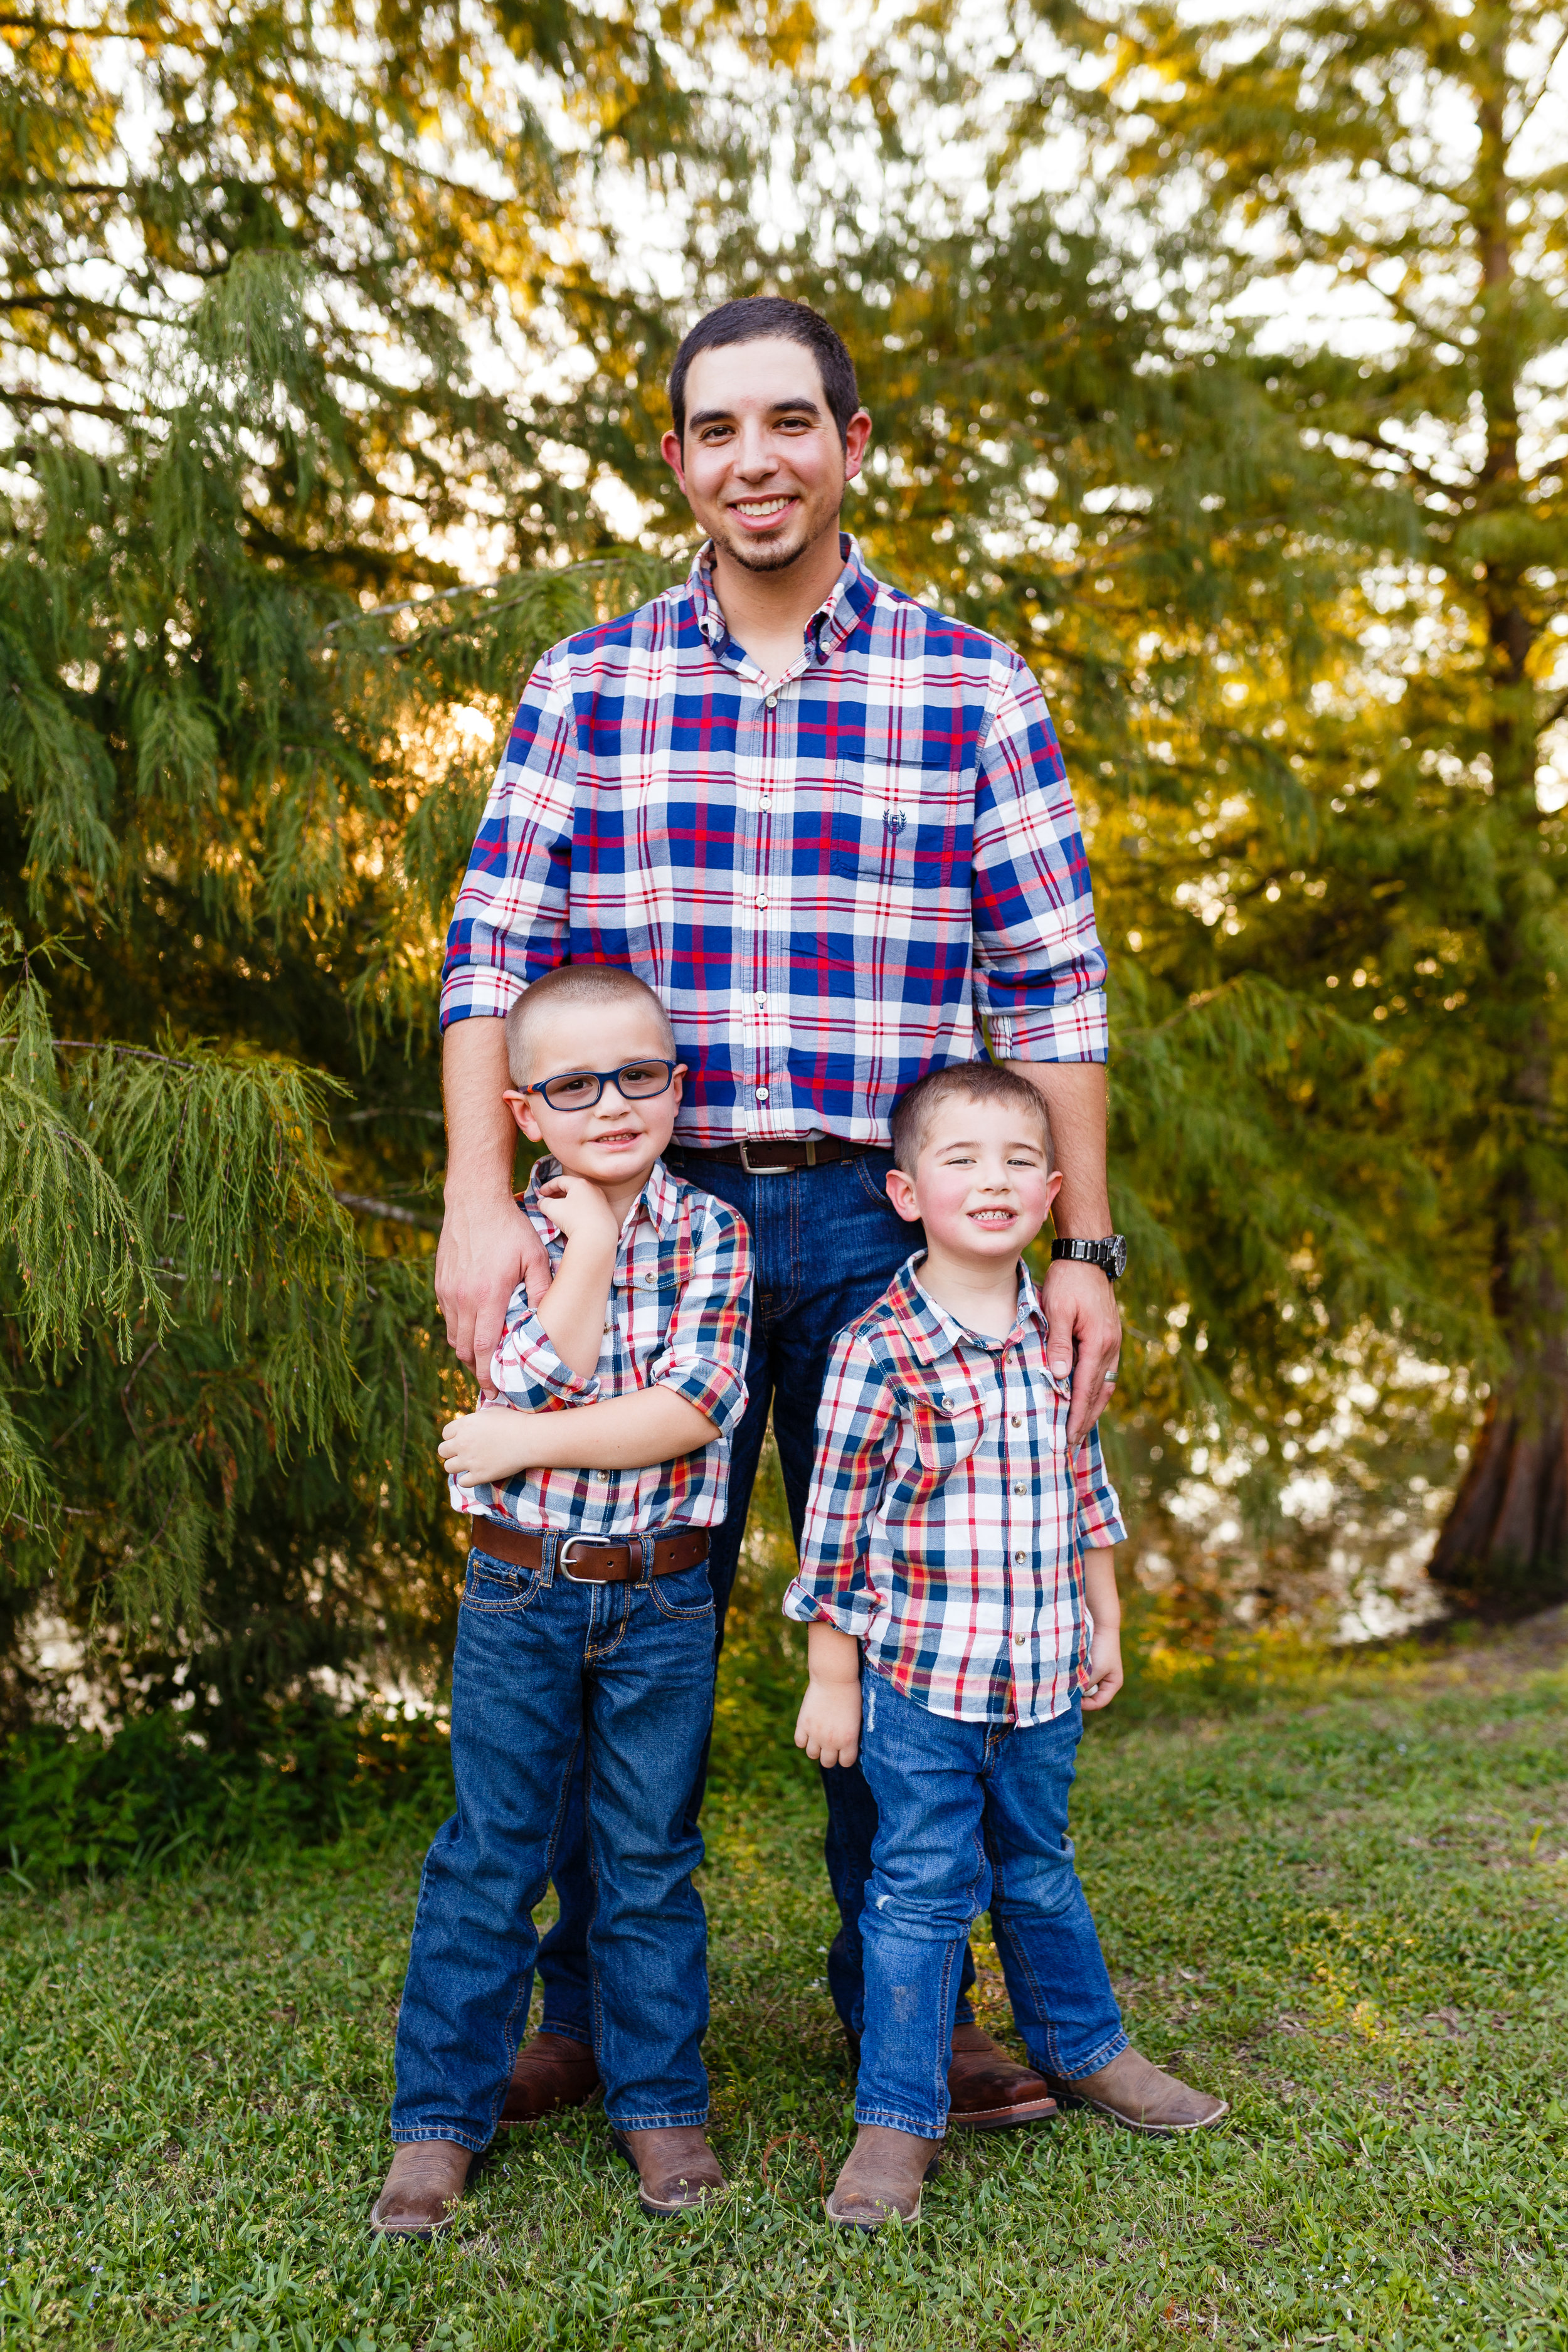 Family-child-portrait-lafayette-broussard-youngsville-photographer-30.jpg